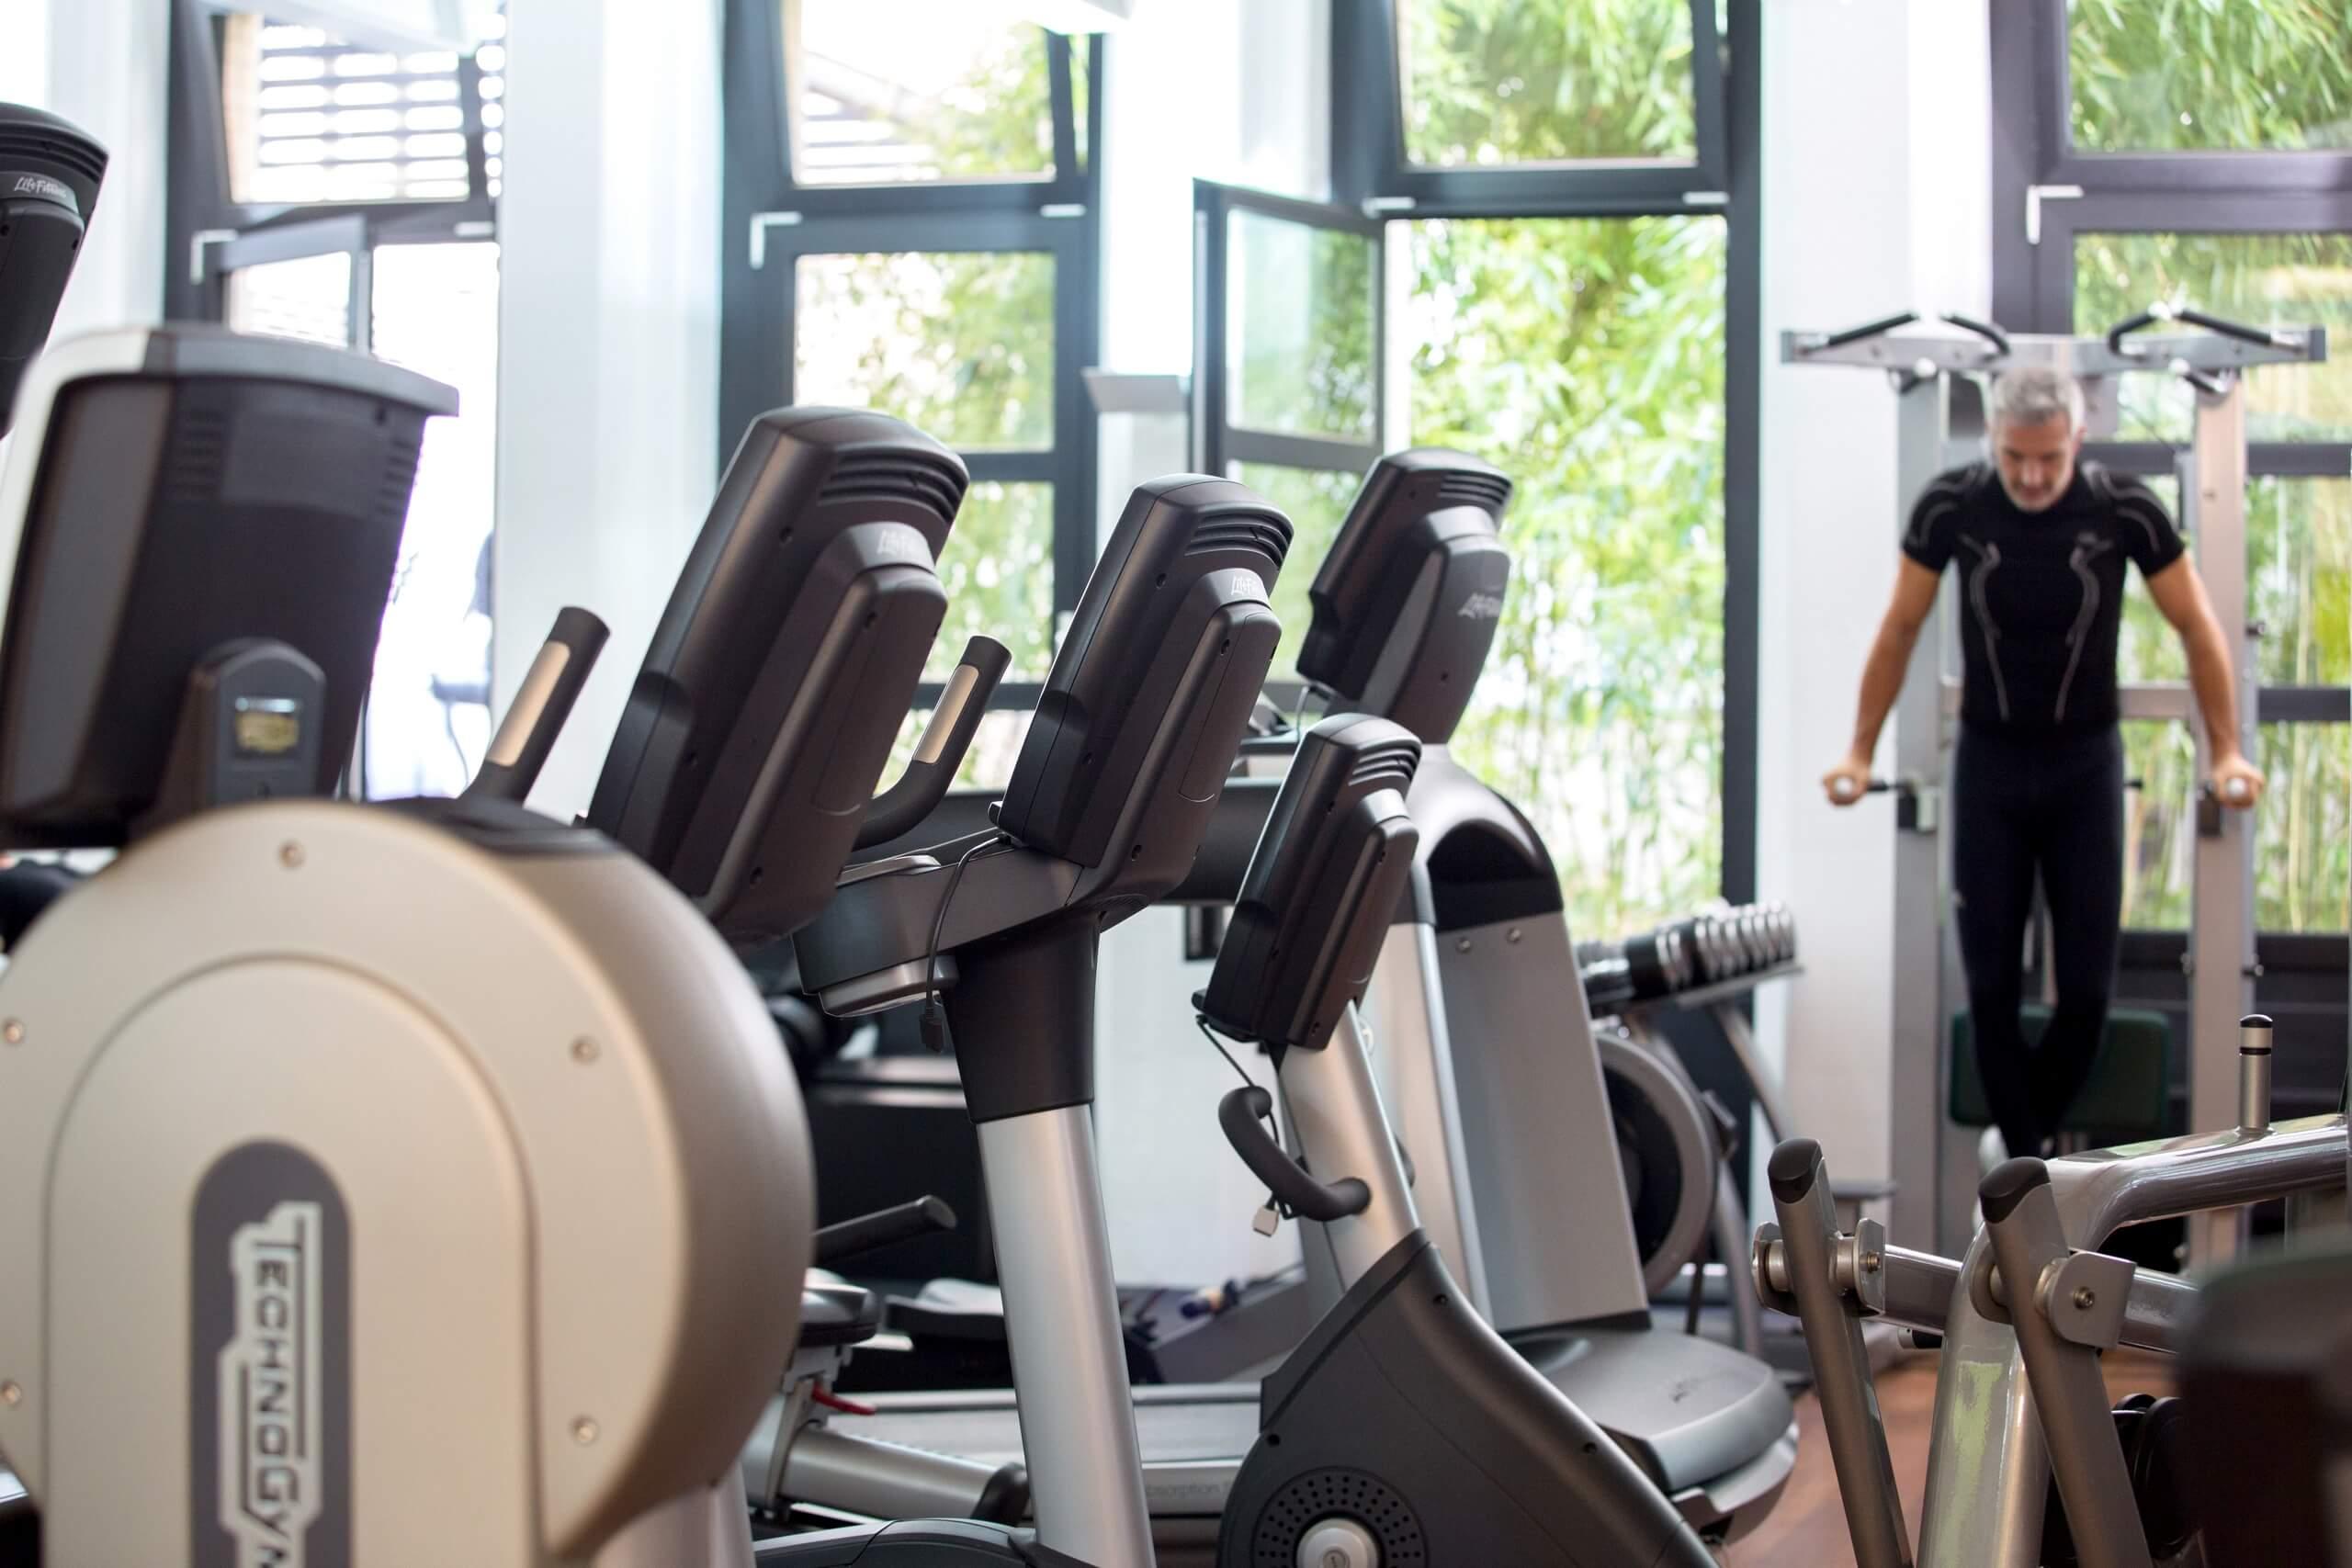 vj-spa-nescens-fitness-sport-trainingsbereich